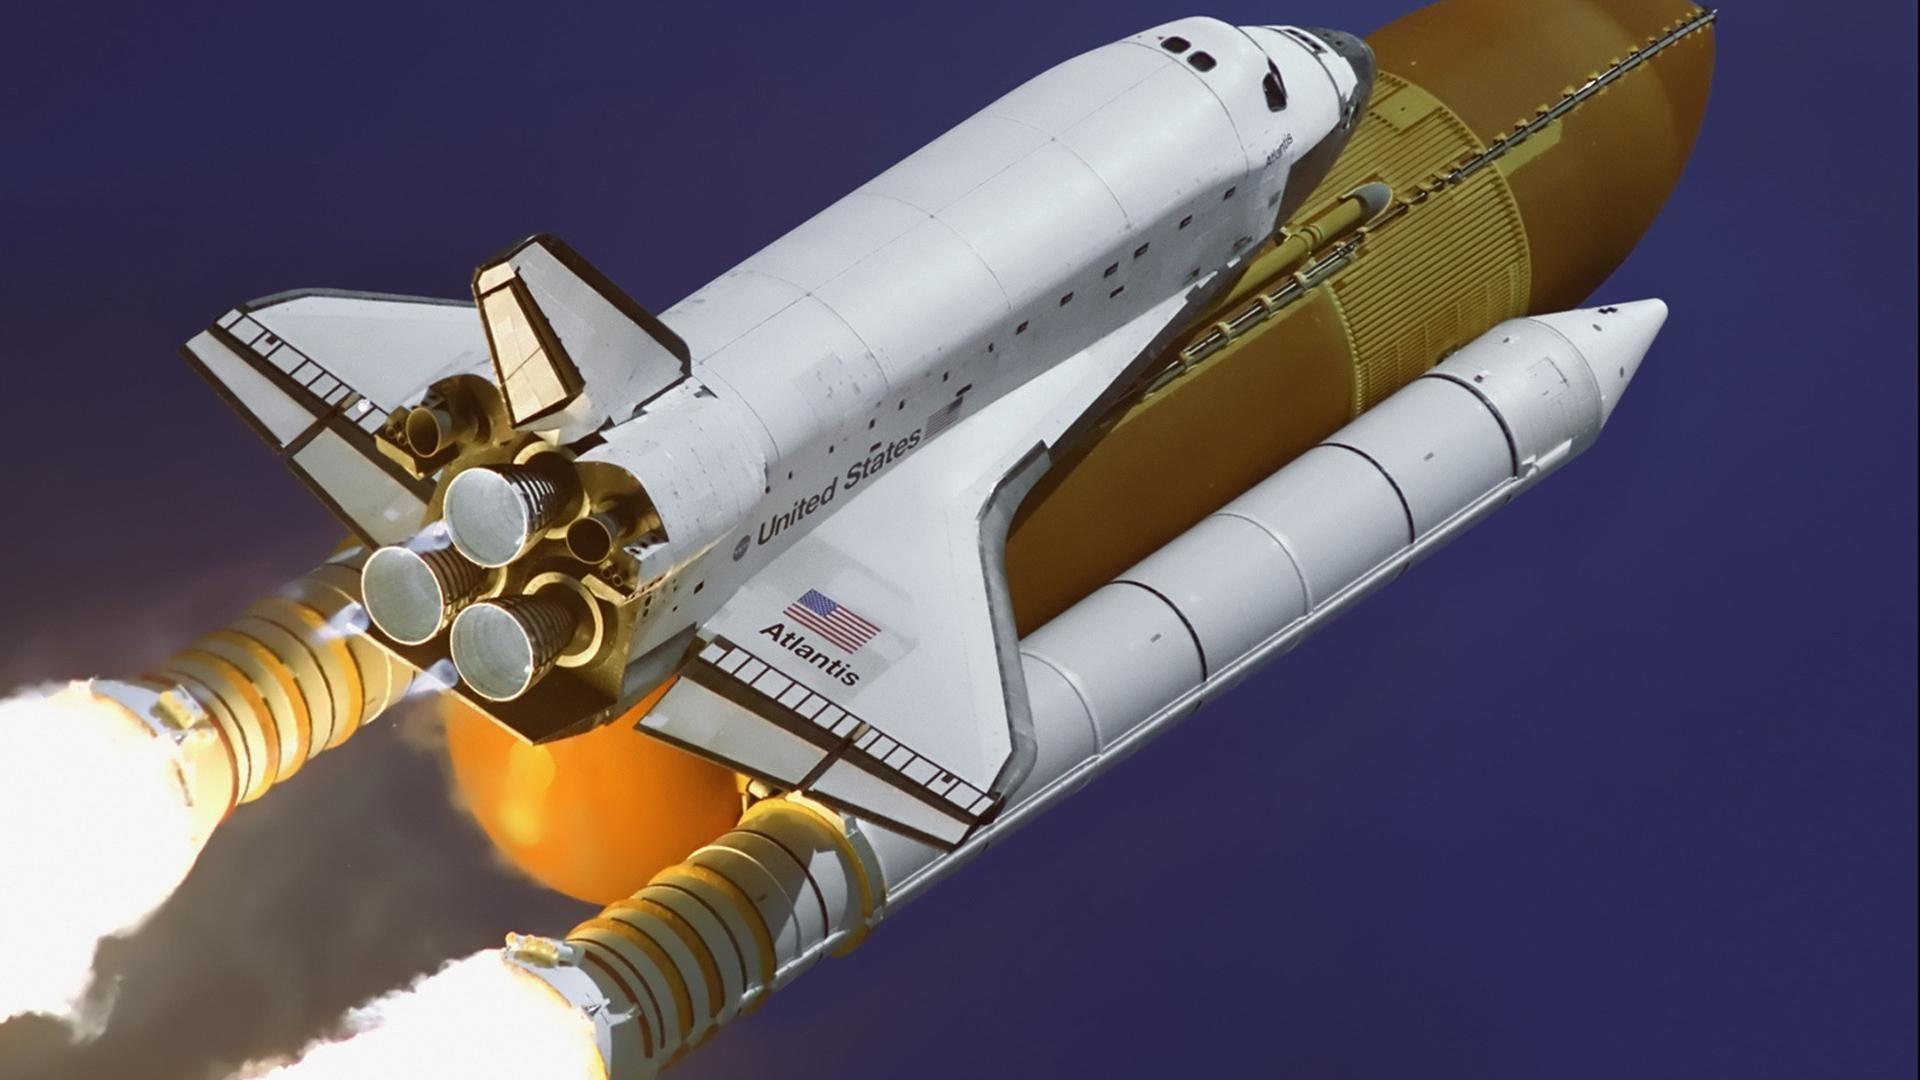 Rocket download wallpaper image